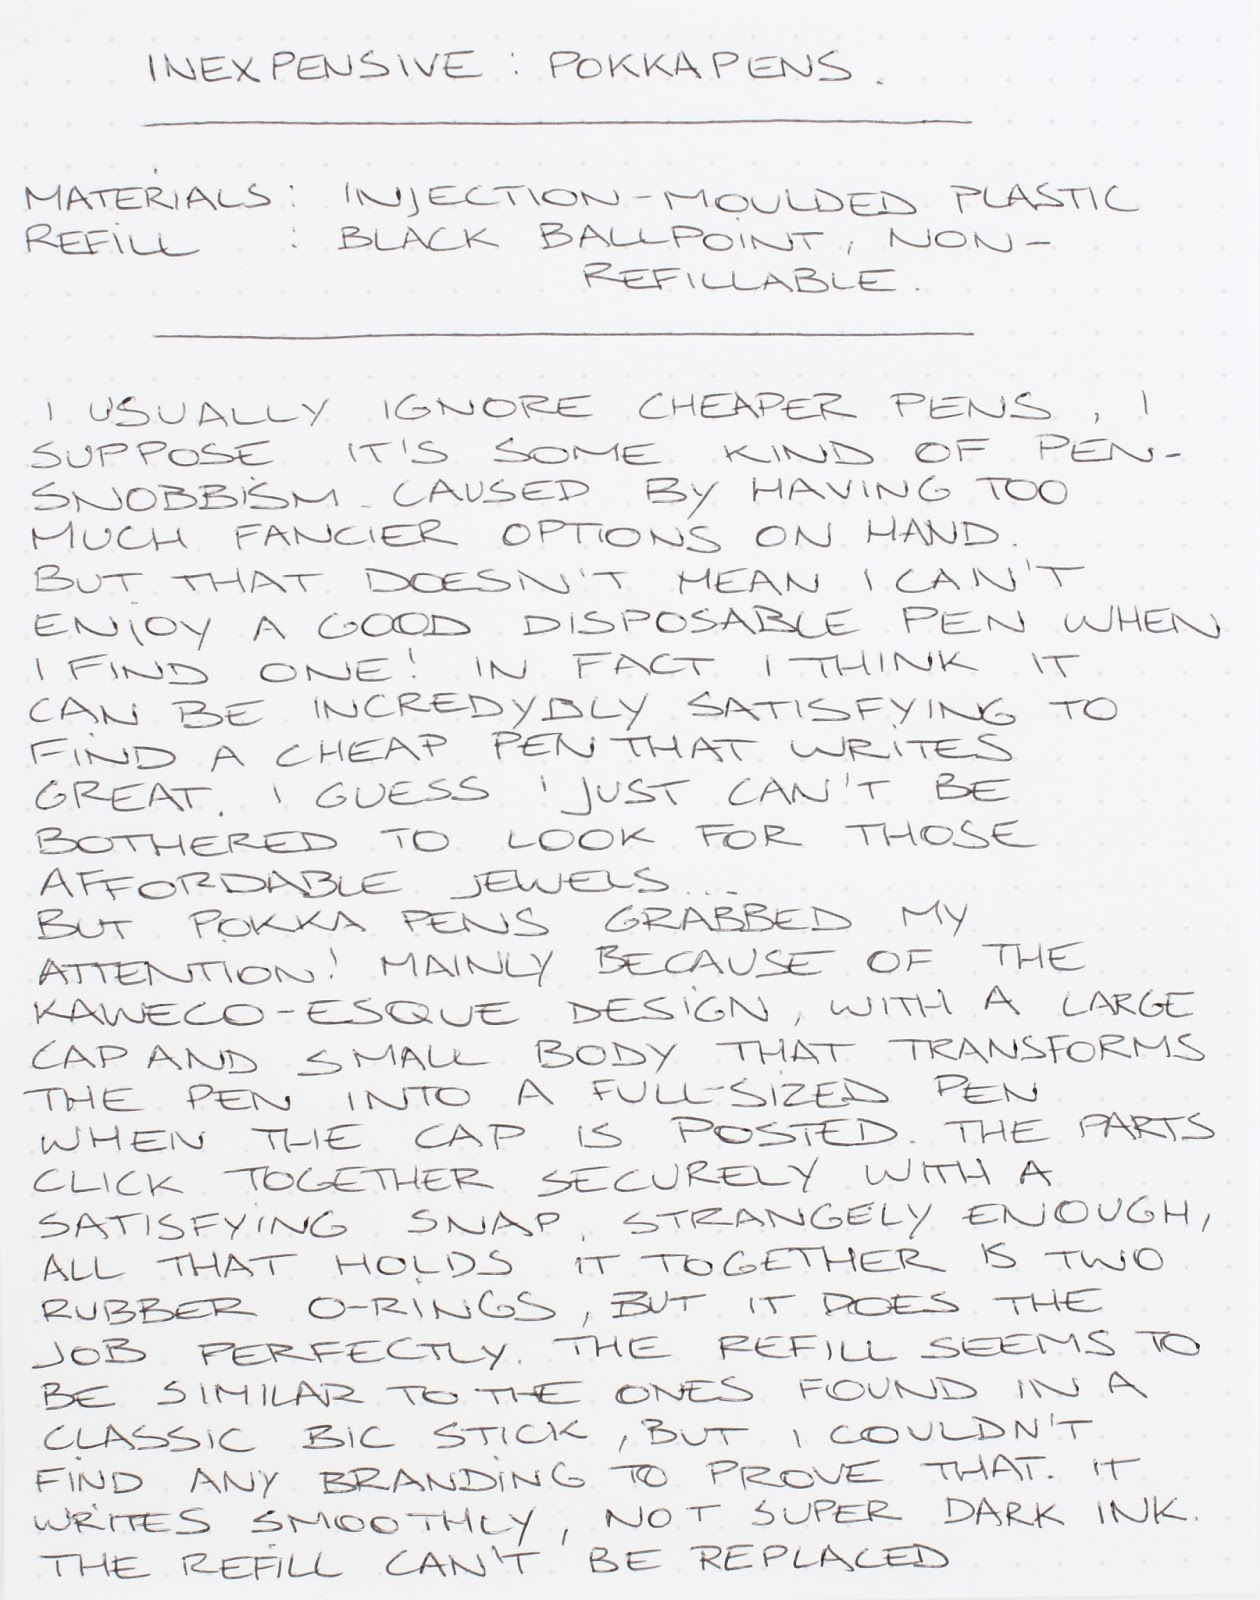 inexpensive pokka pens pocket pen review the pencilcase blog Cheap Canon Ink inexpensive pokka pens pocket pen review